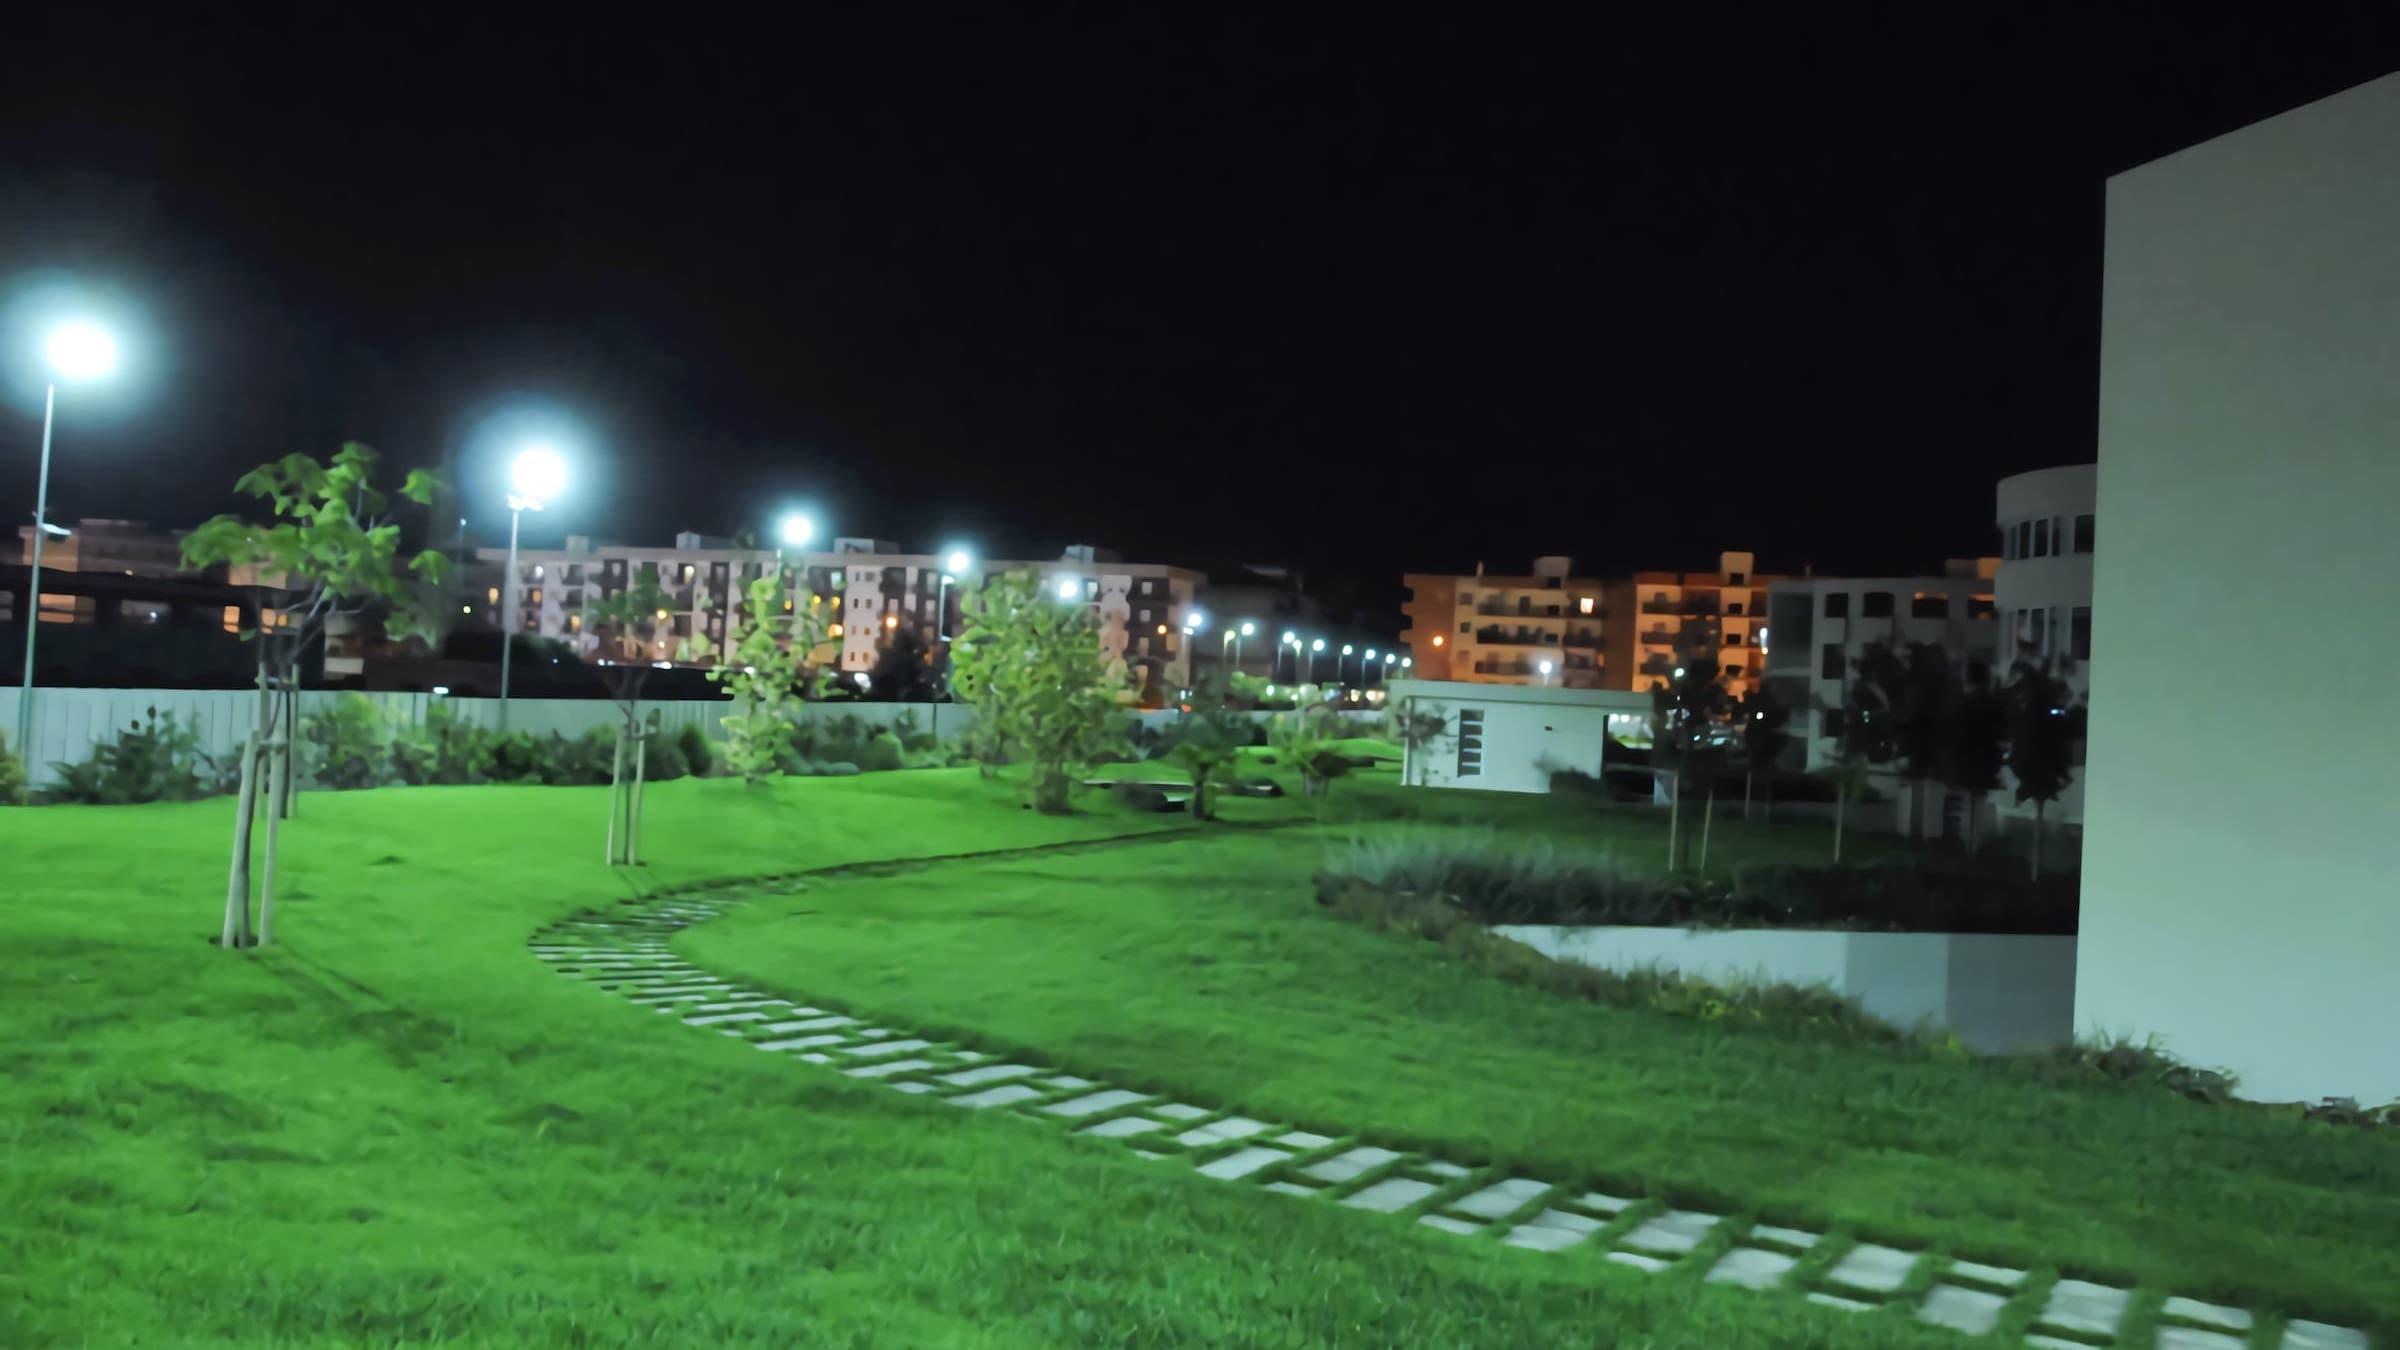 led-street-lights-installation-in-Italy